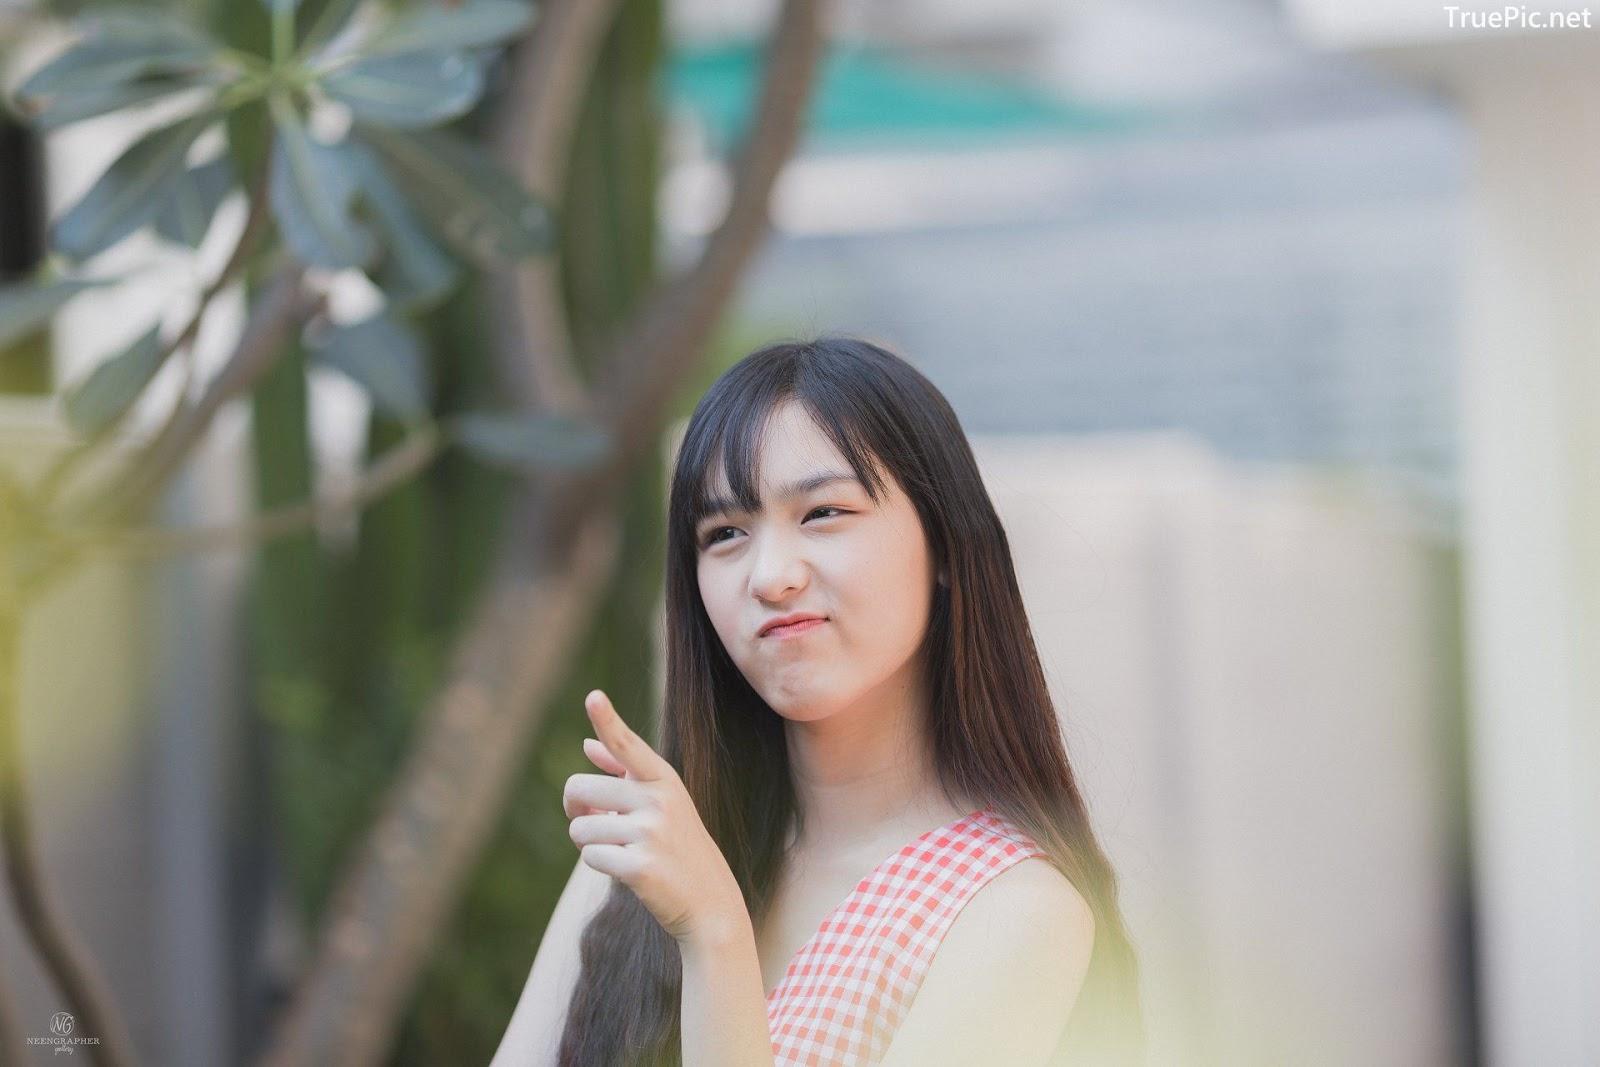 Image-Thailand-Cute-Model-Emma-Panisara–Album-Emma-Bright-Sunday-TruePic.net- Picture-24